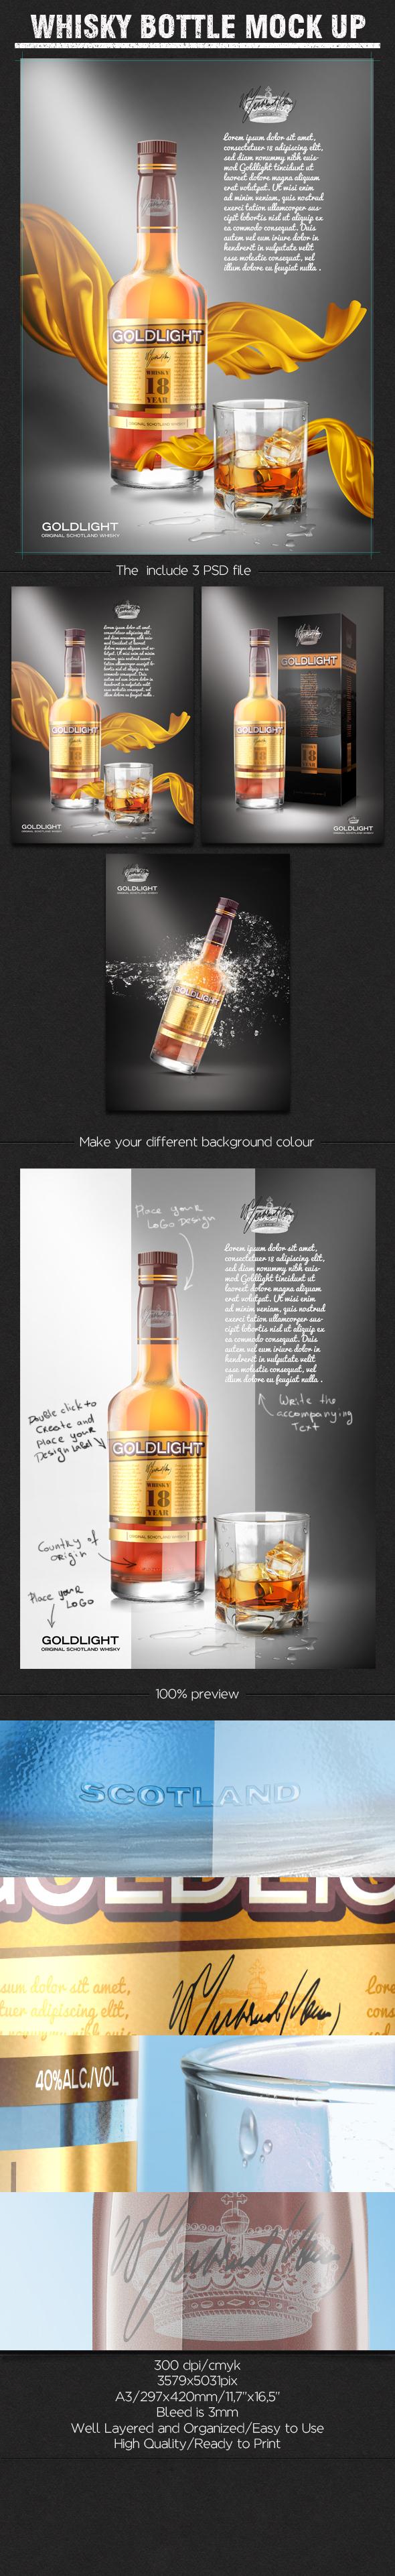 Whisky Bottle Mock Up Free On Behance Whisky Bottle Bottle Mockup Packaging Mockup